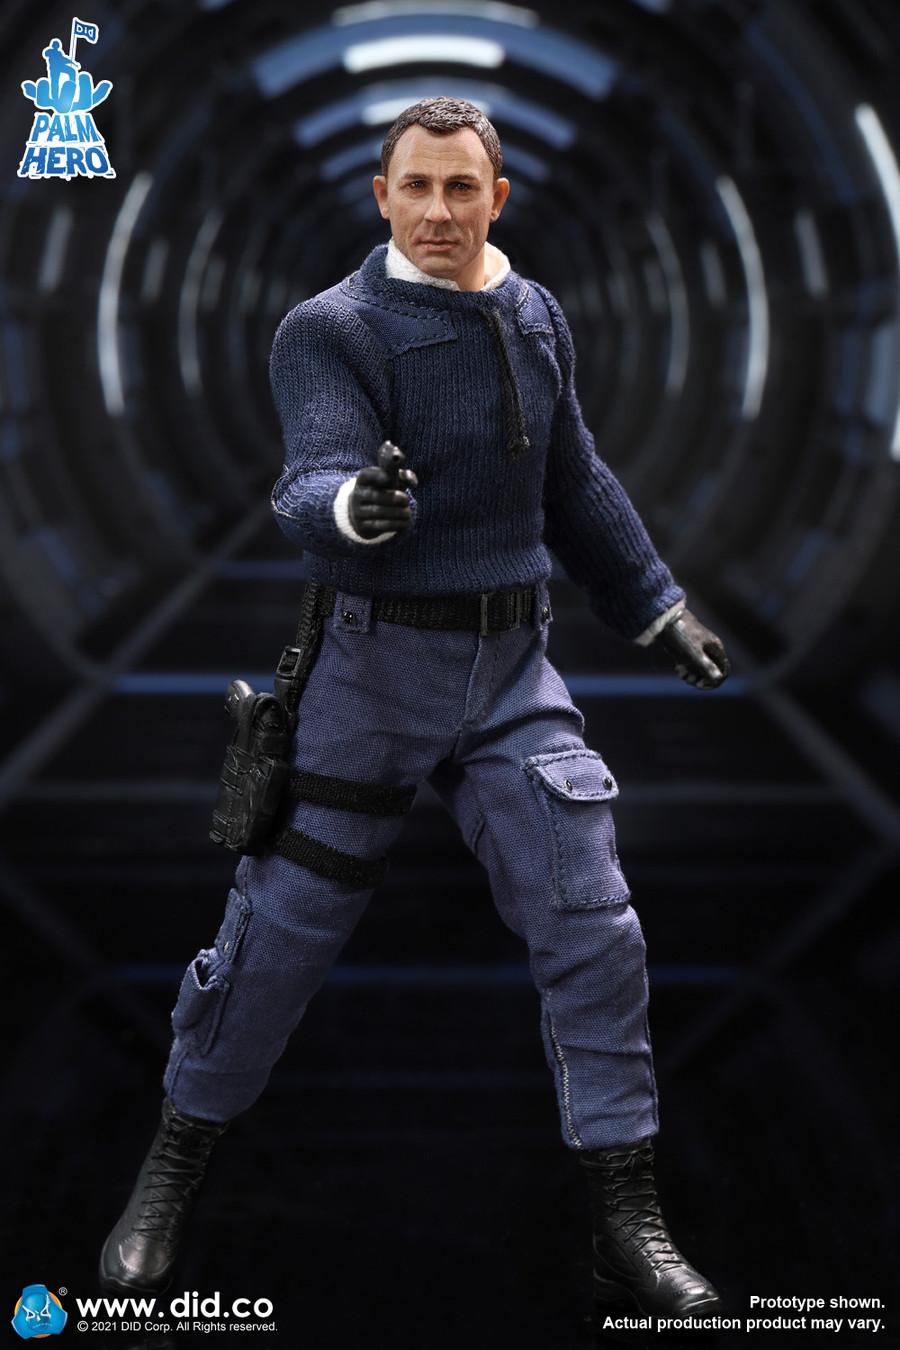 DID - 1/12 Palm Hero MI6 Agent Jack